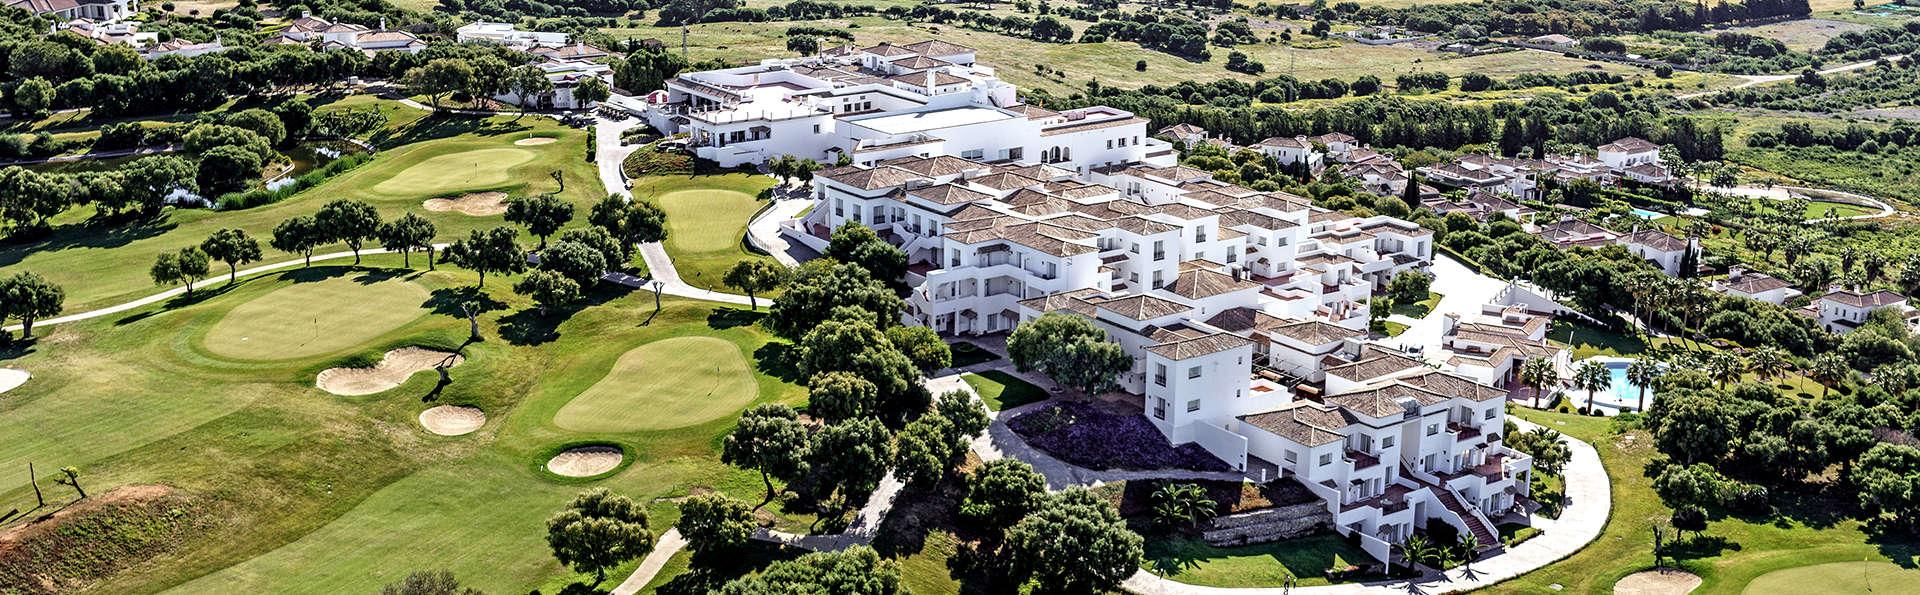 Fairplay Golf & Spa Resort 5* - EDIT_NEW_VIEW.jpg